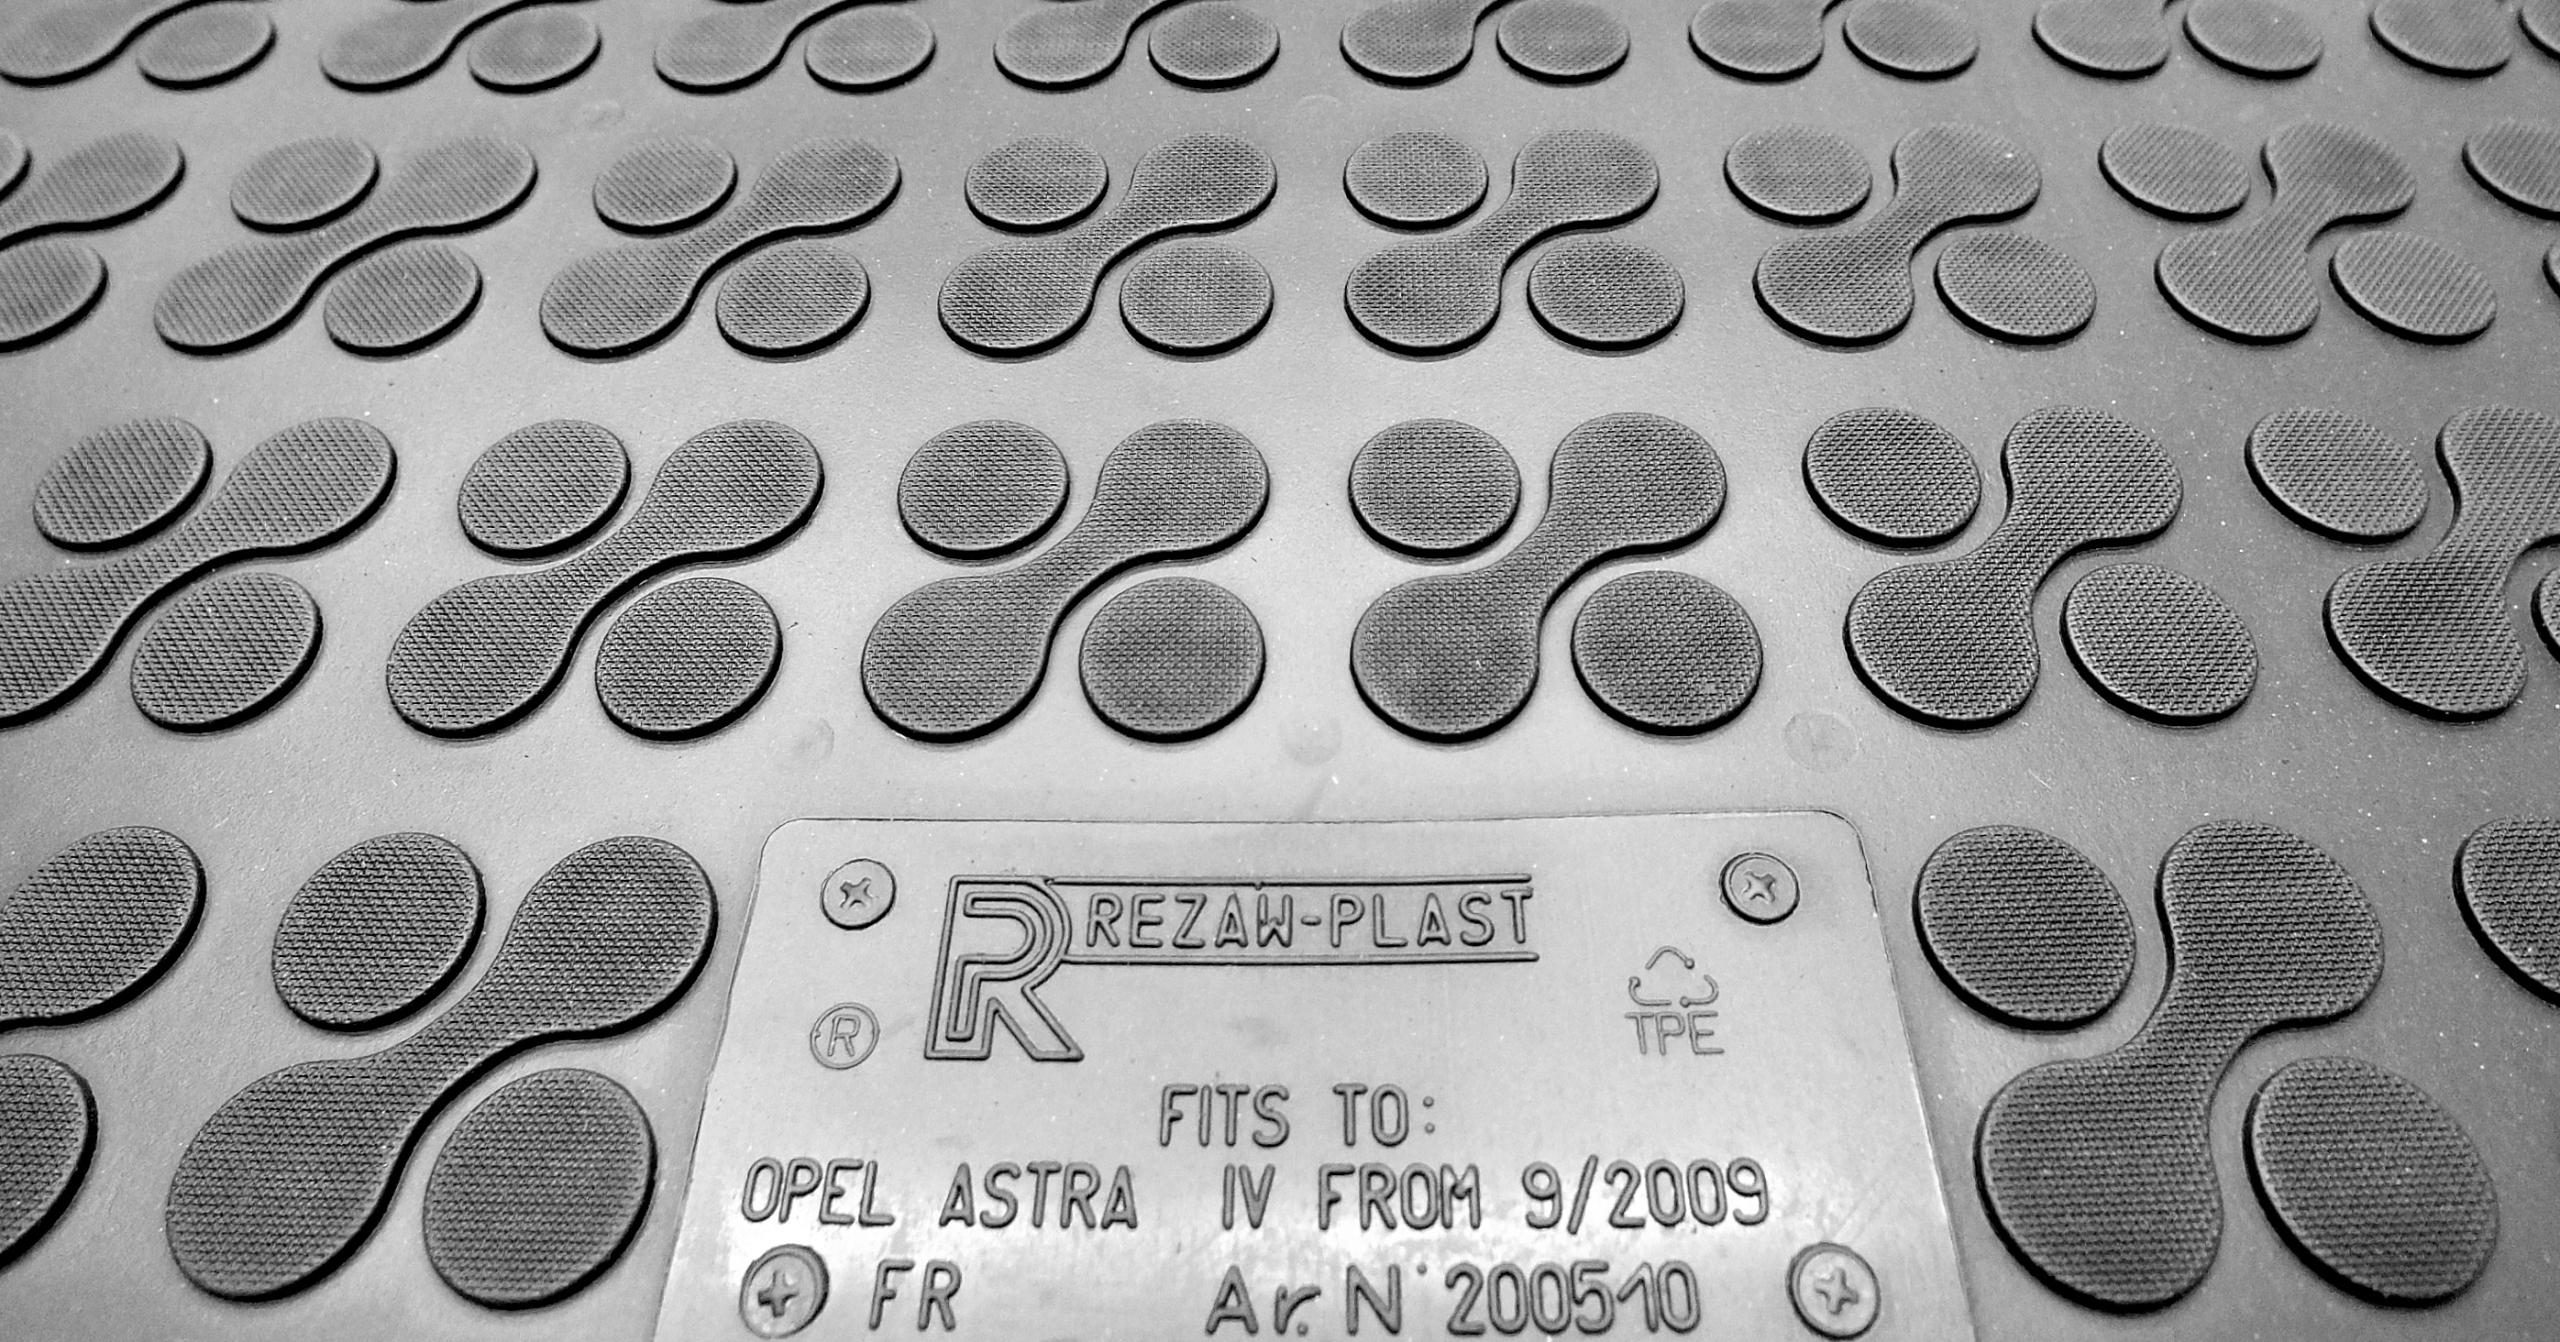 Opel Astra IV J 09/2009-2015 резиновые коврики громкие слова